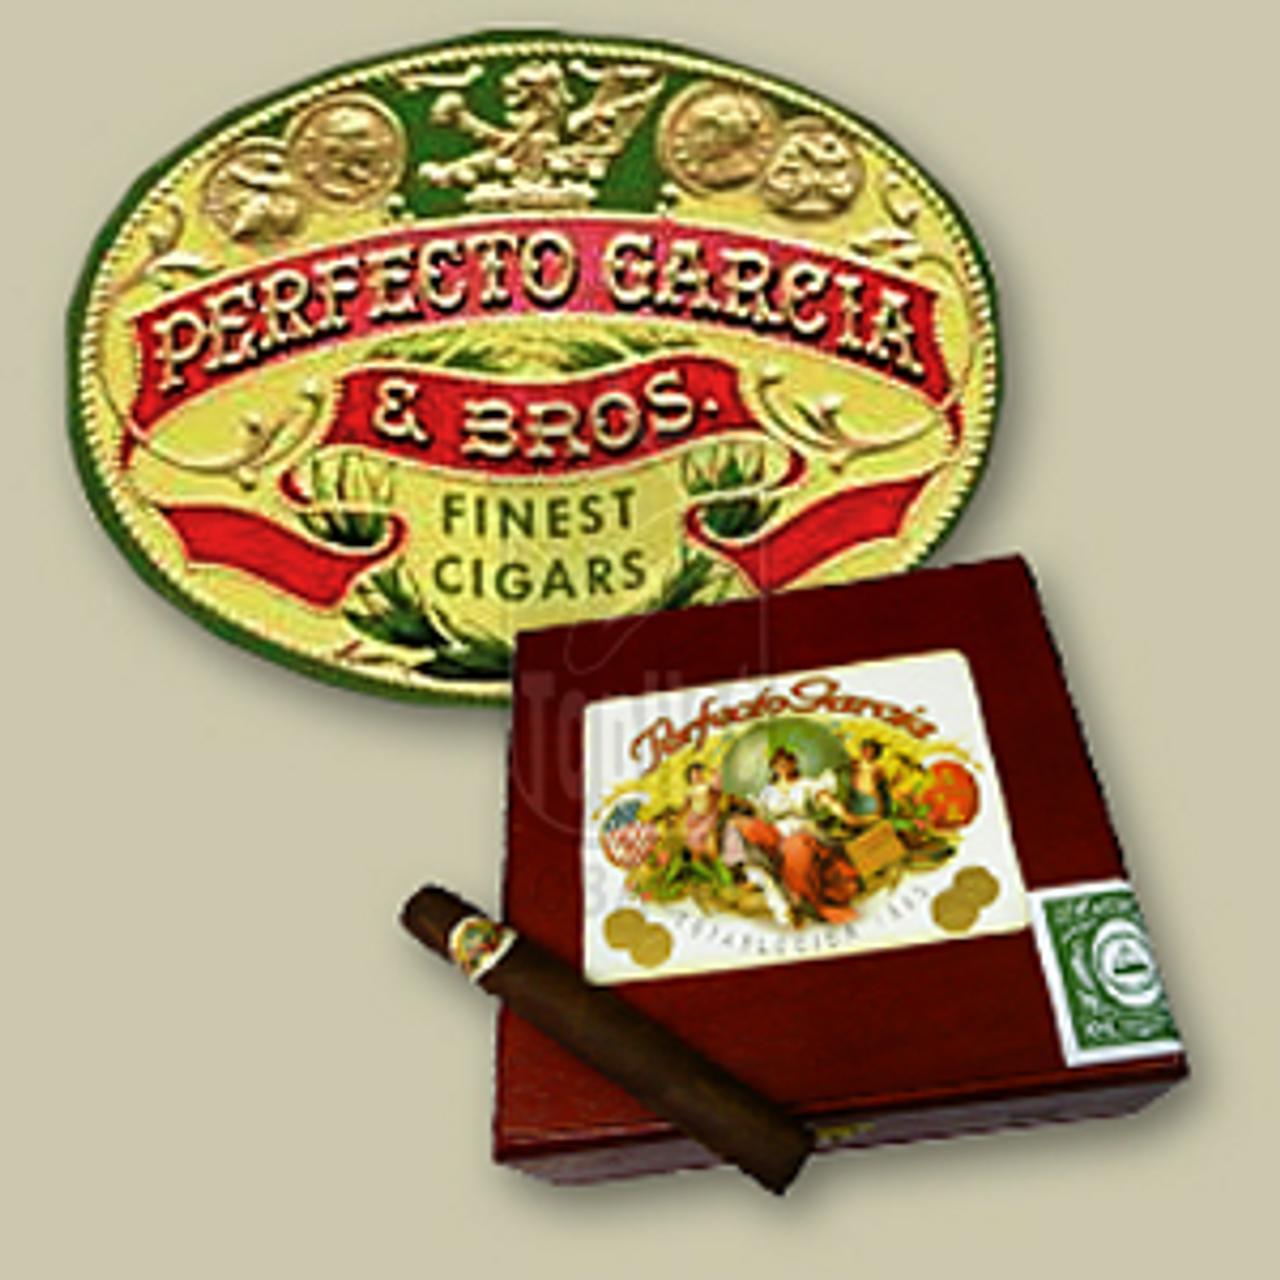 Perfecto Garcia Magnum Maduro Cigars - 6 x 50 (Box of 25)